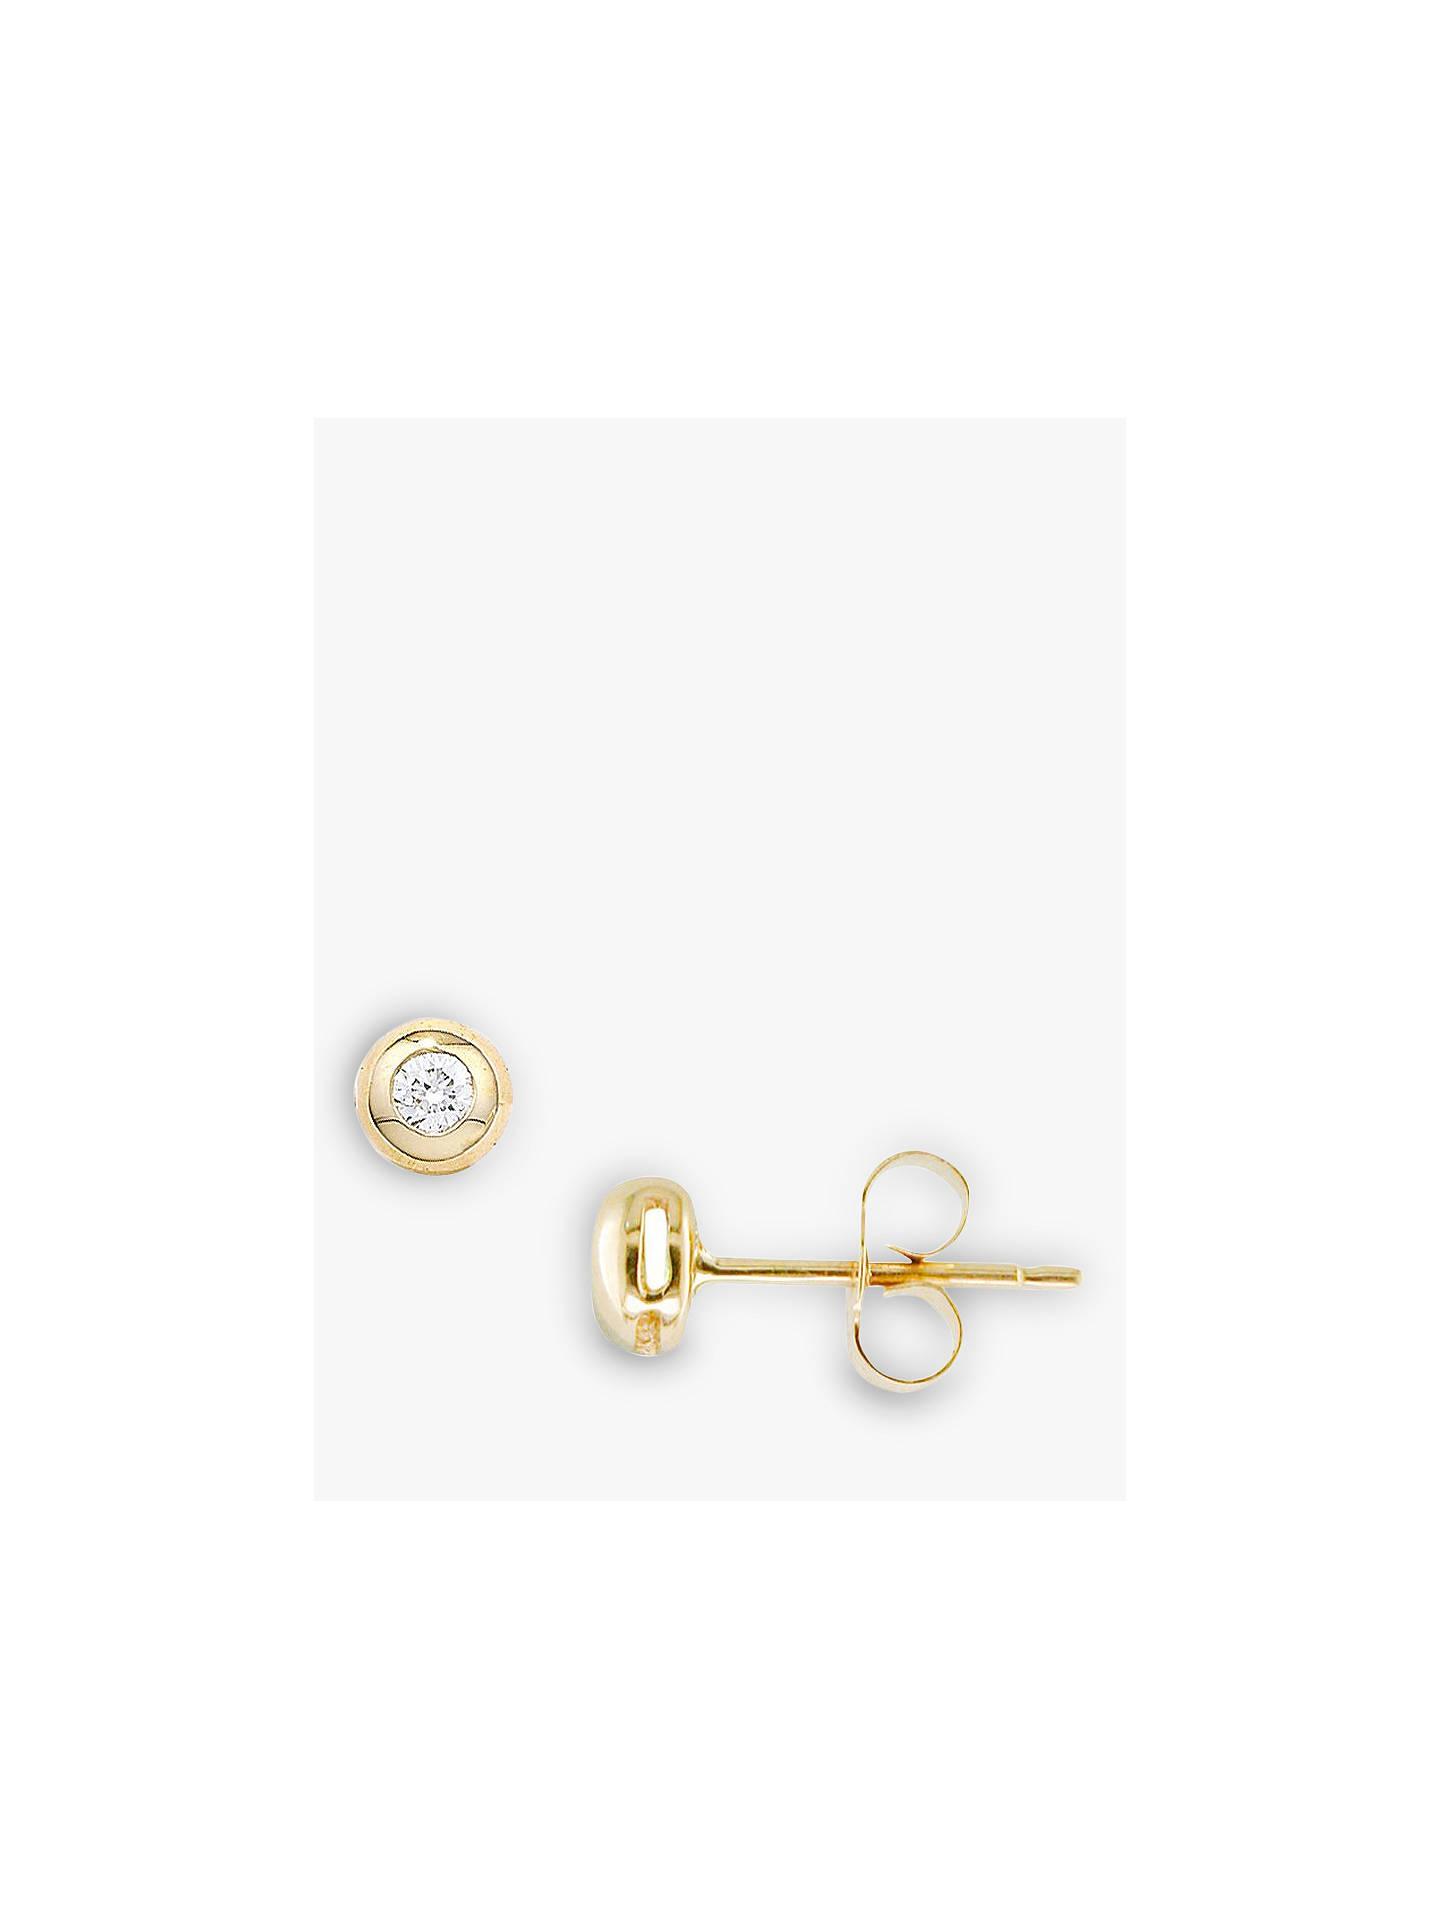 260d20d83 Buy E.W Adams 9ct Yellow Gold Single Stone Diamond Stud Earrings, Gold  Online at johnlewis ...